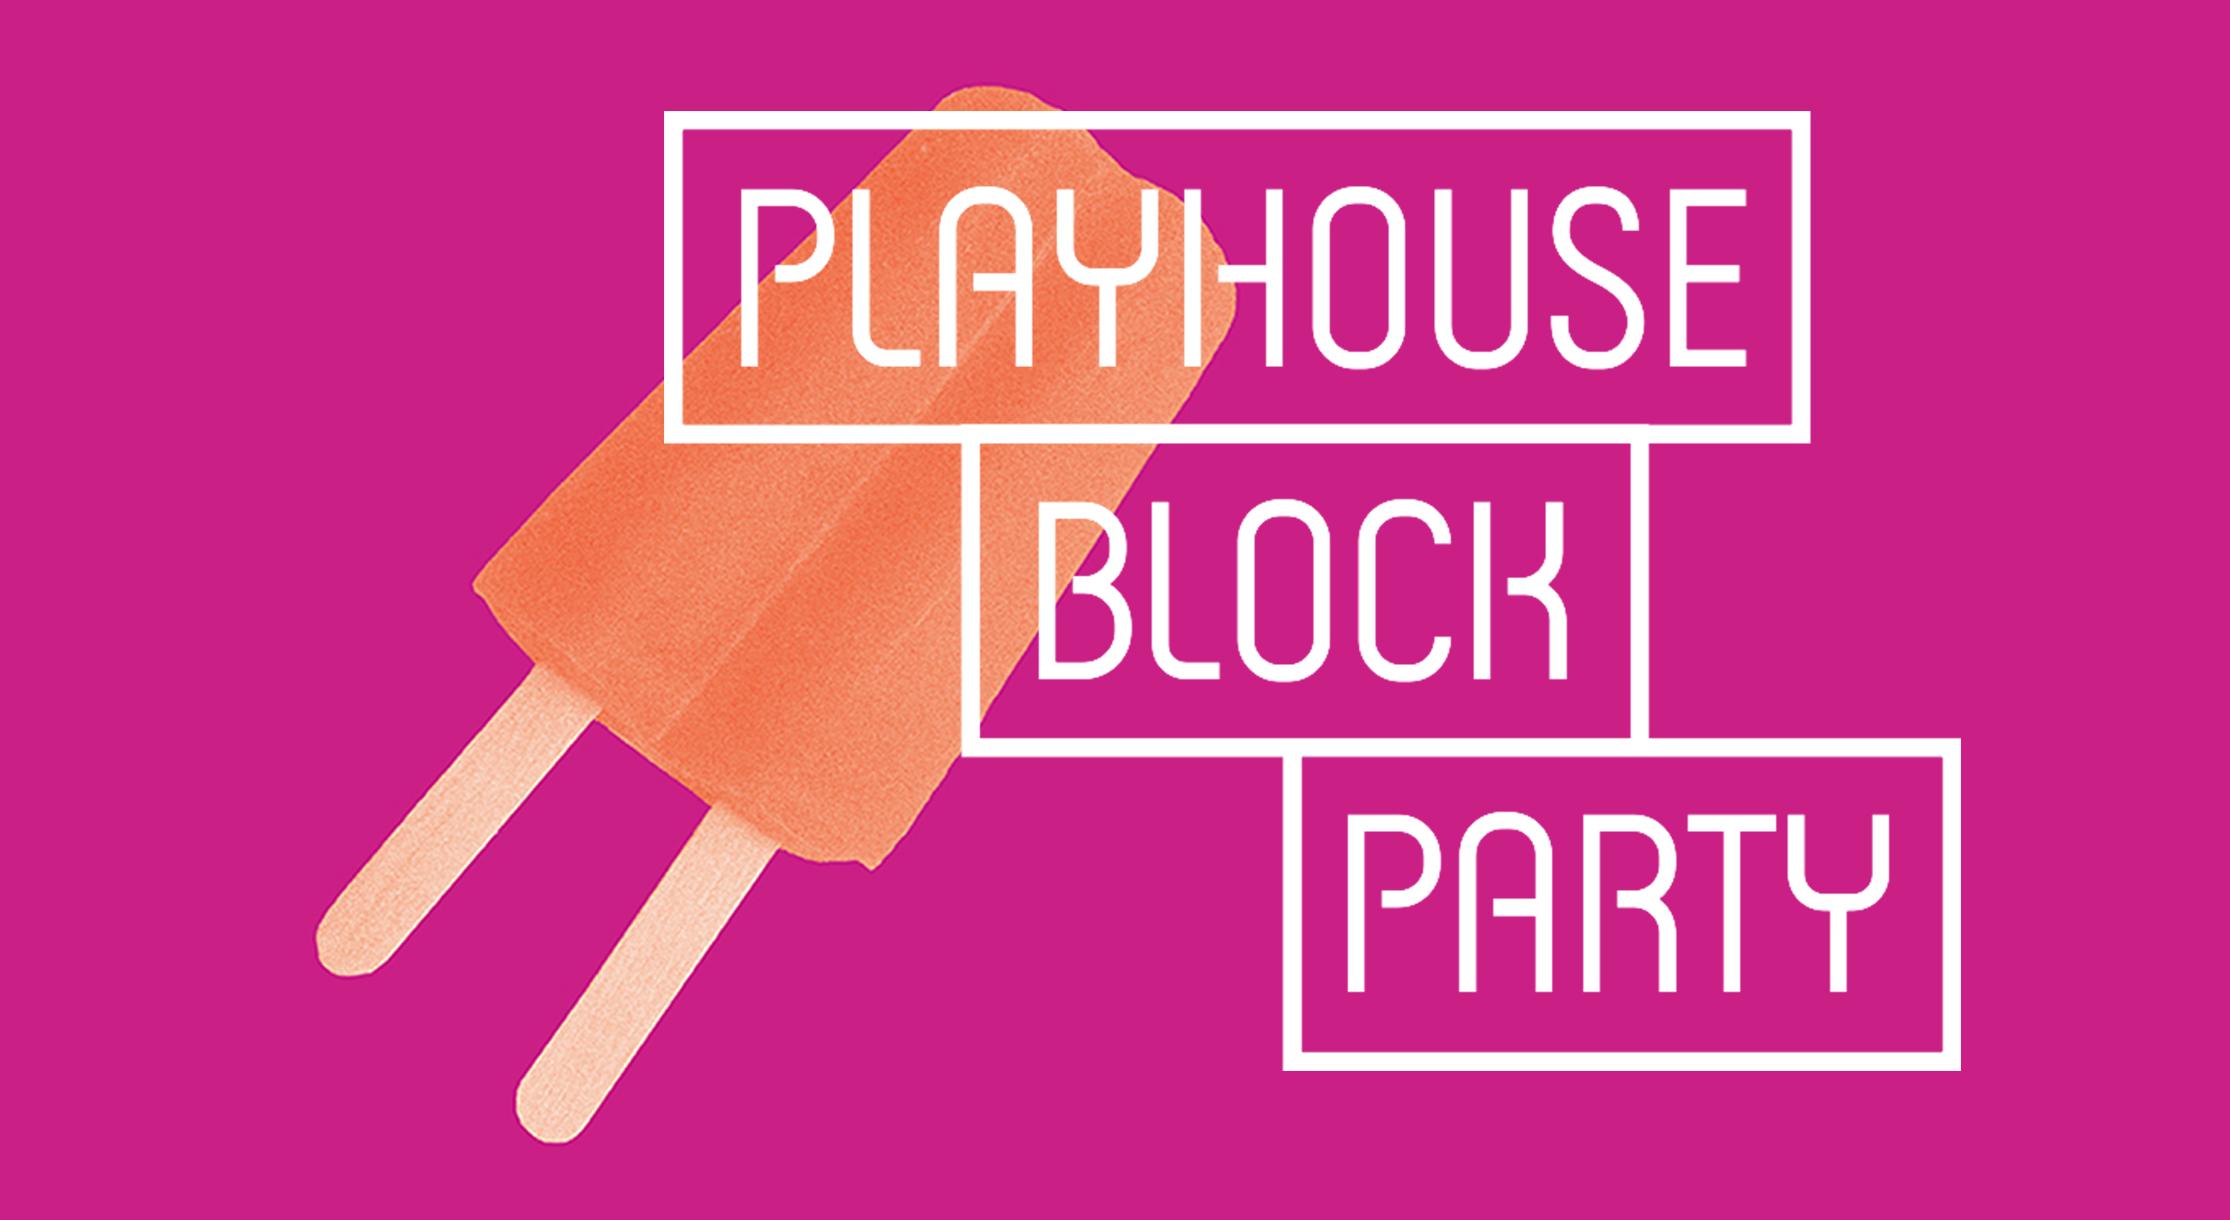 Playhouse Block Party